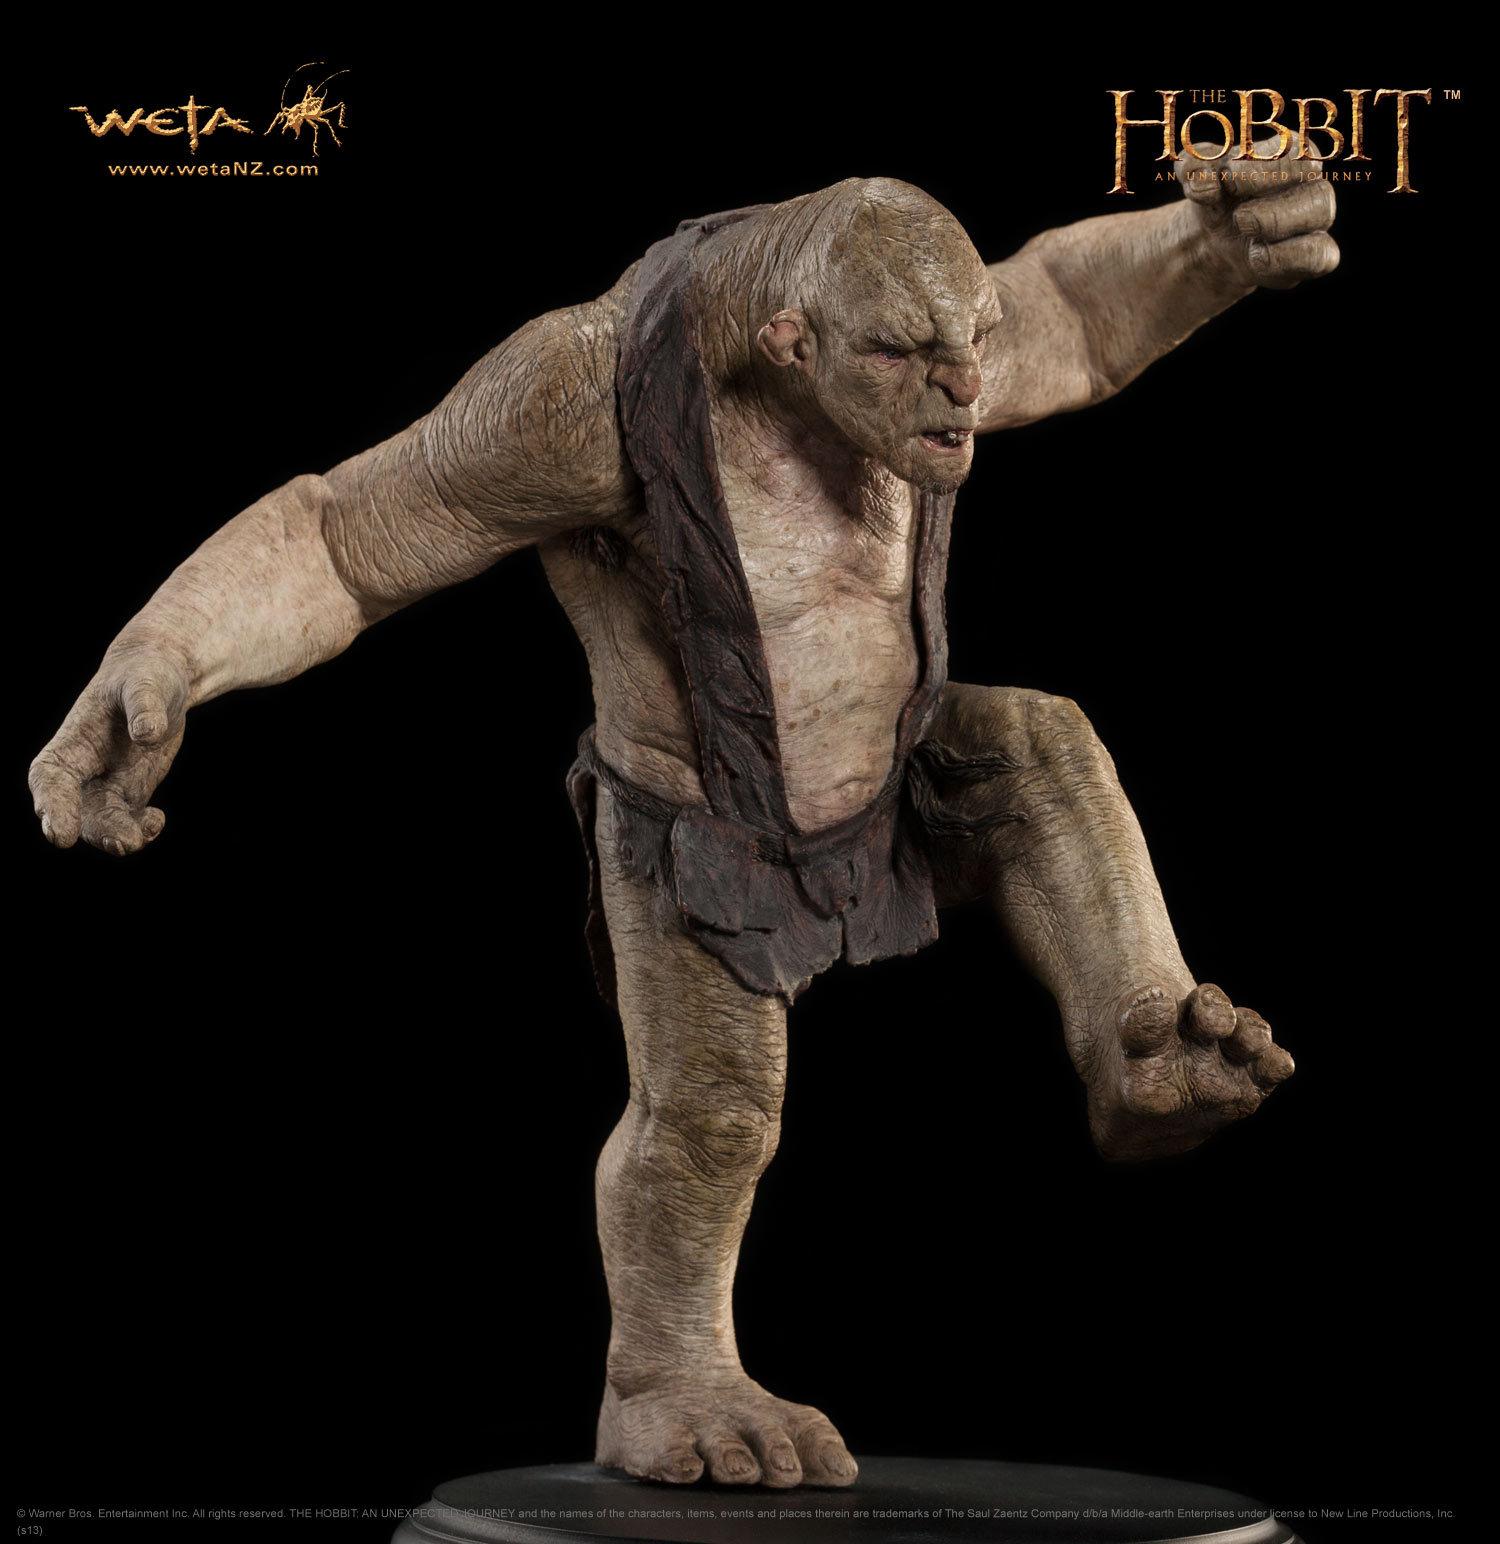 trolls from the hobbit